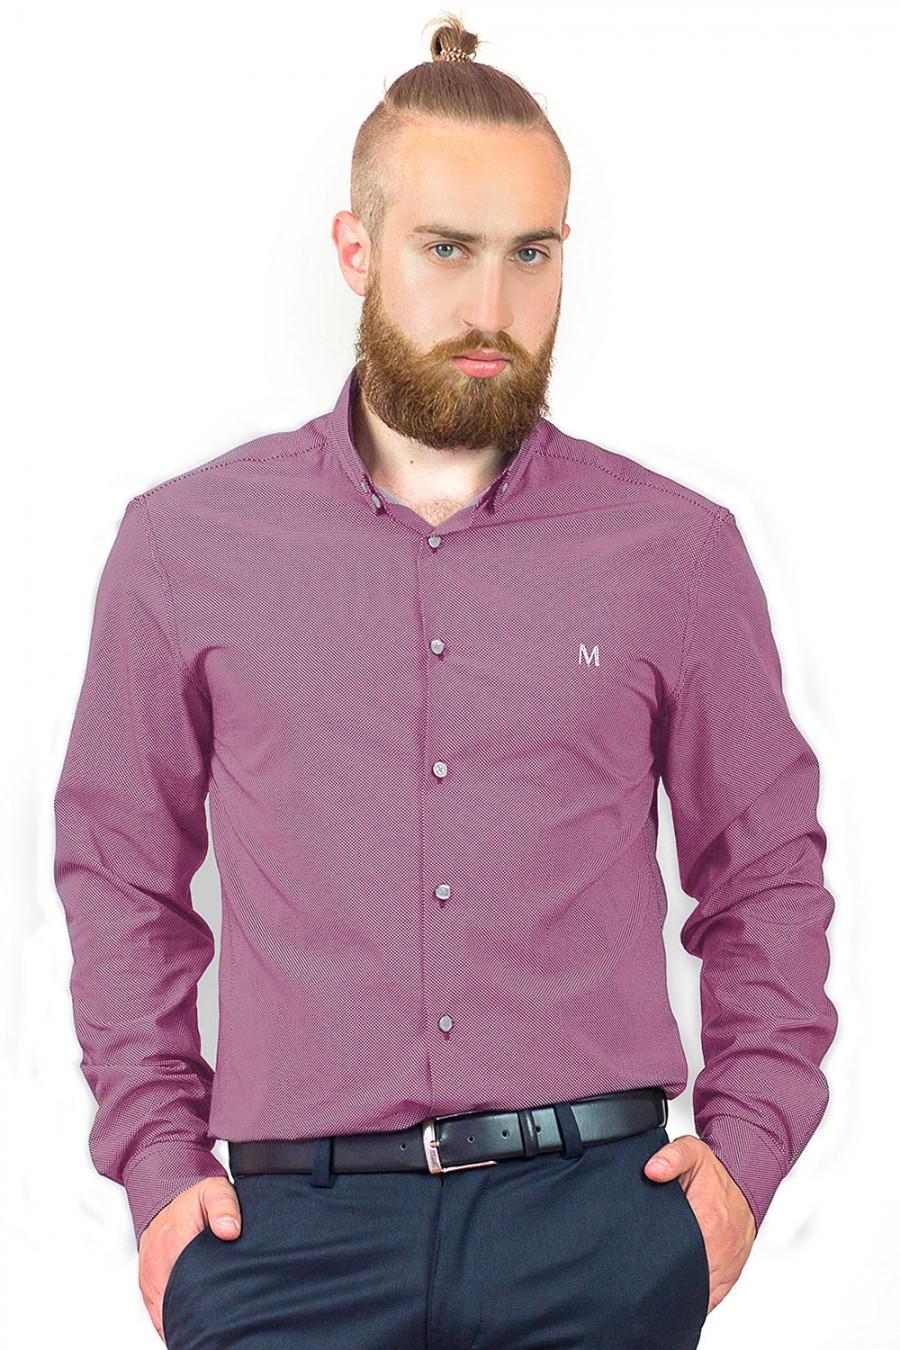 Мужская рубашка S-119-16